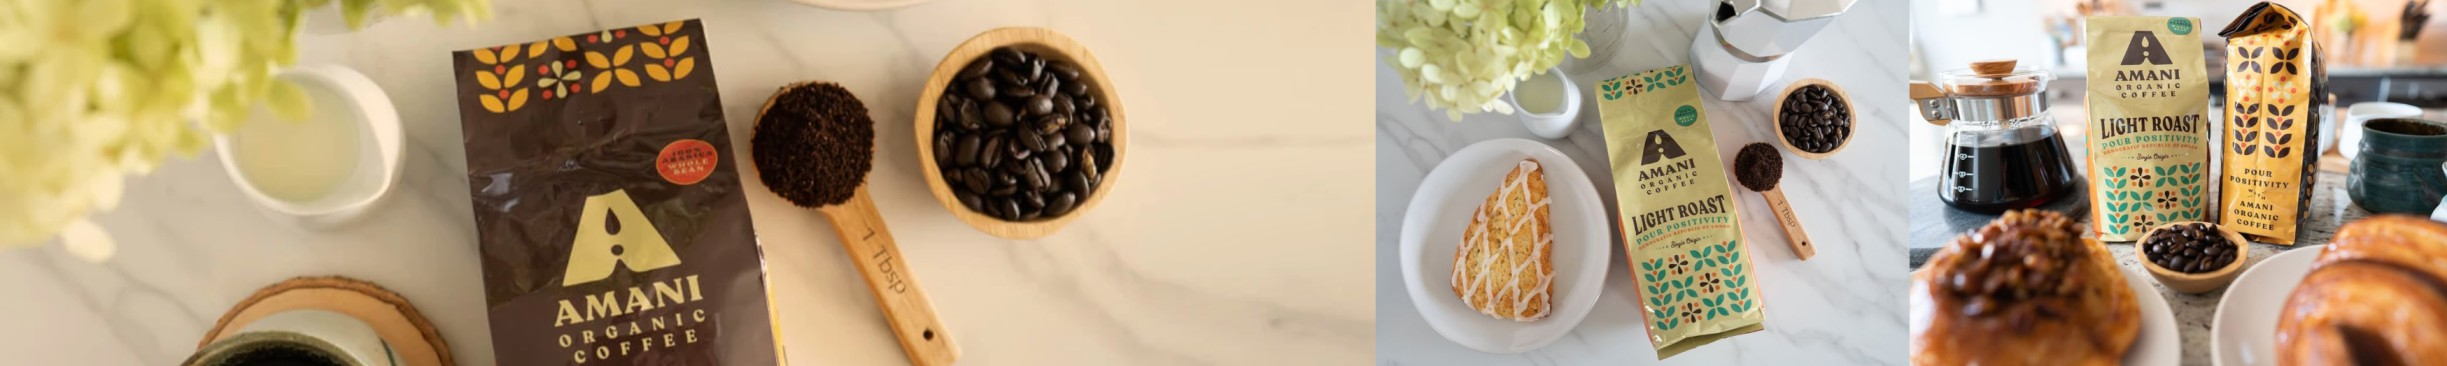 Amani Coffee Company